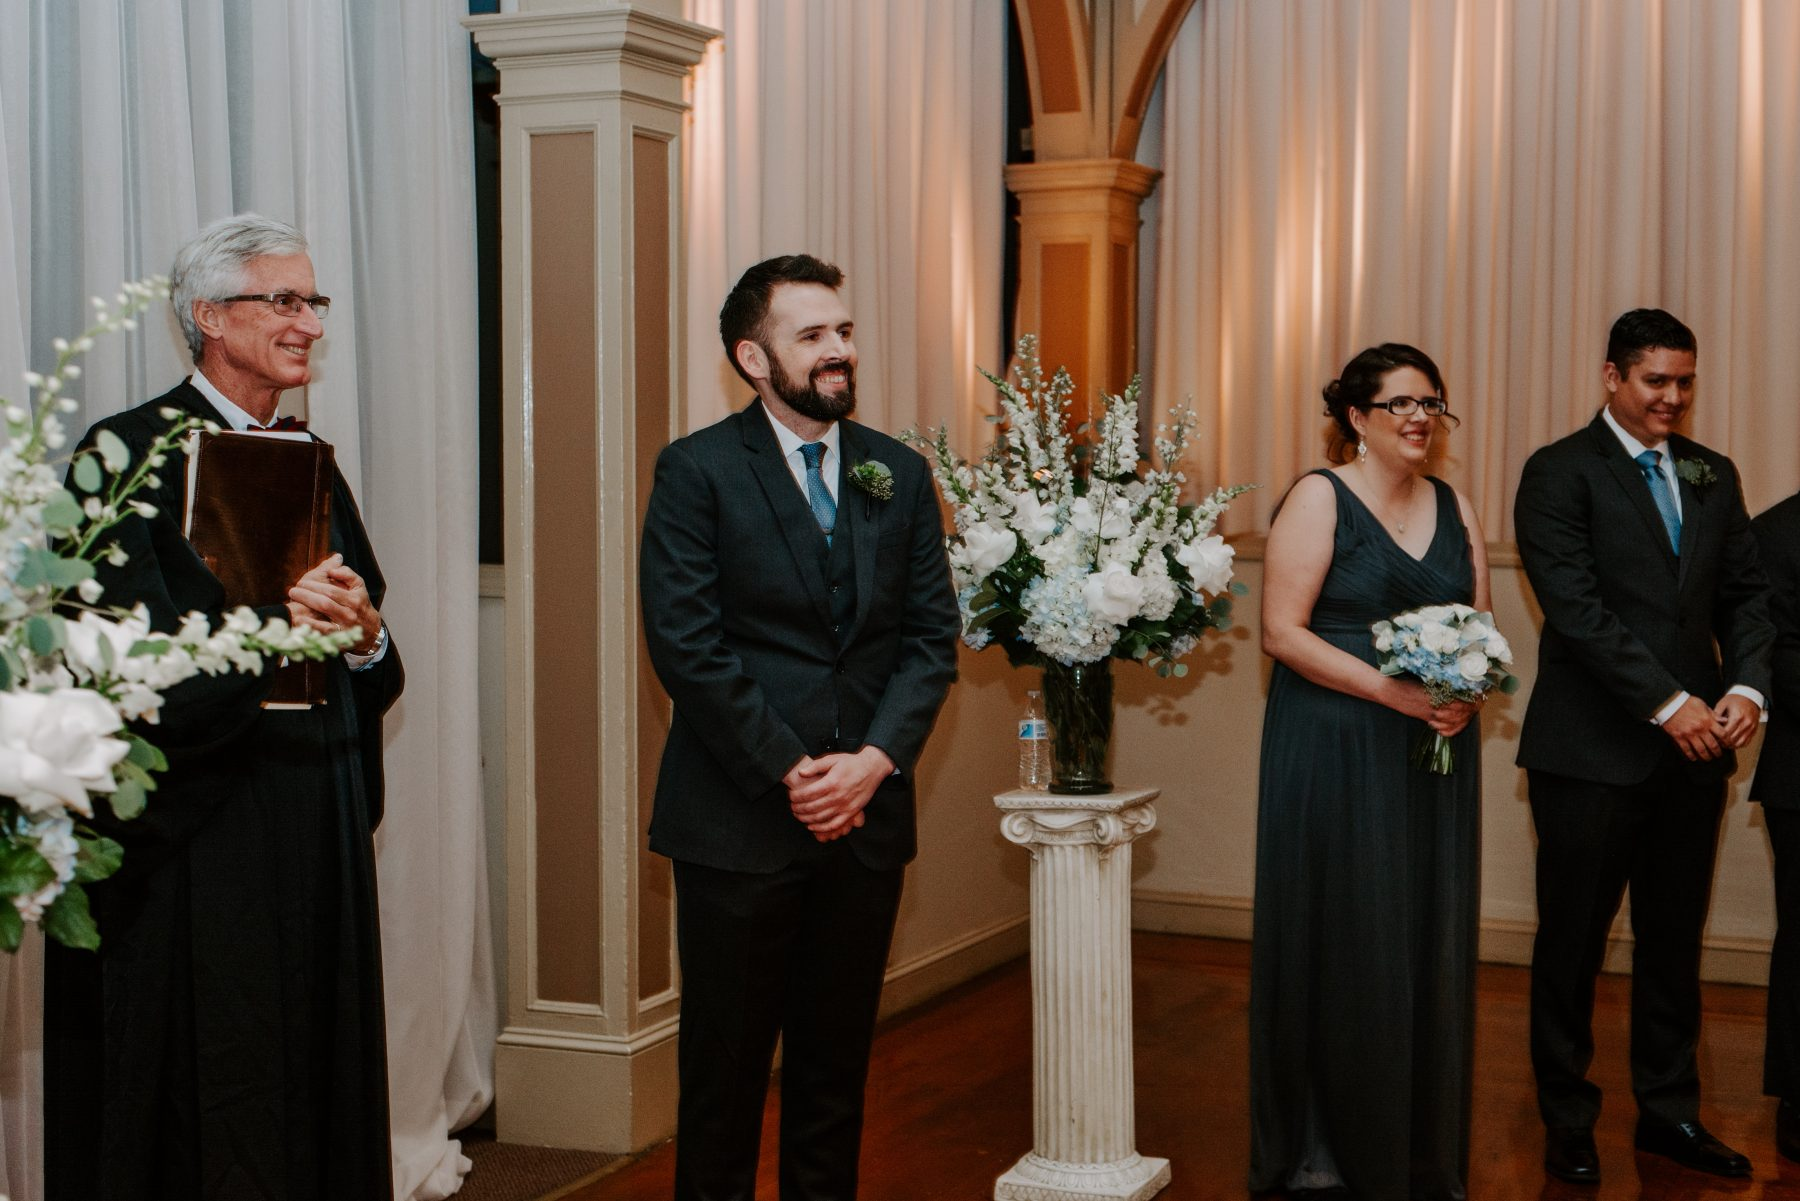 Rhodes on the Pawtuxet Cranston Wedding Ashley and David Blueflash Photography 12